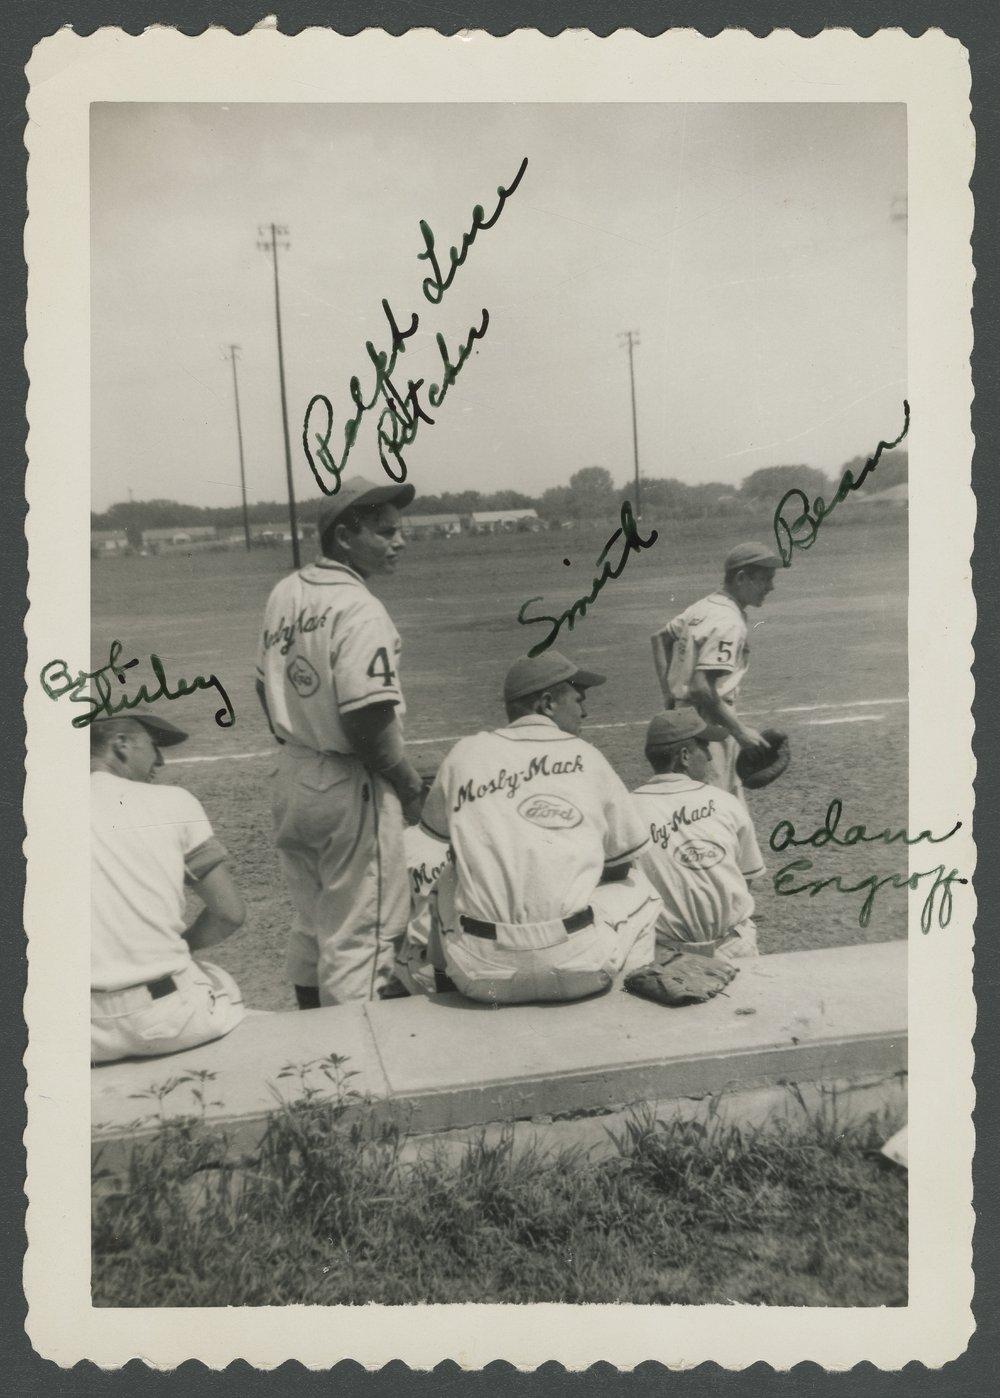 Mosby-Mack baseball team members in Topeka, Kansas - 6